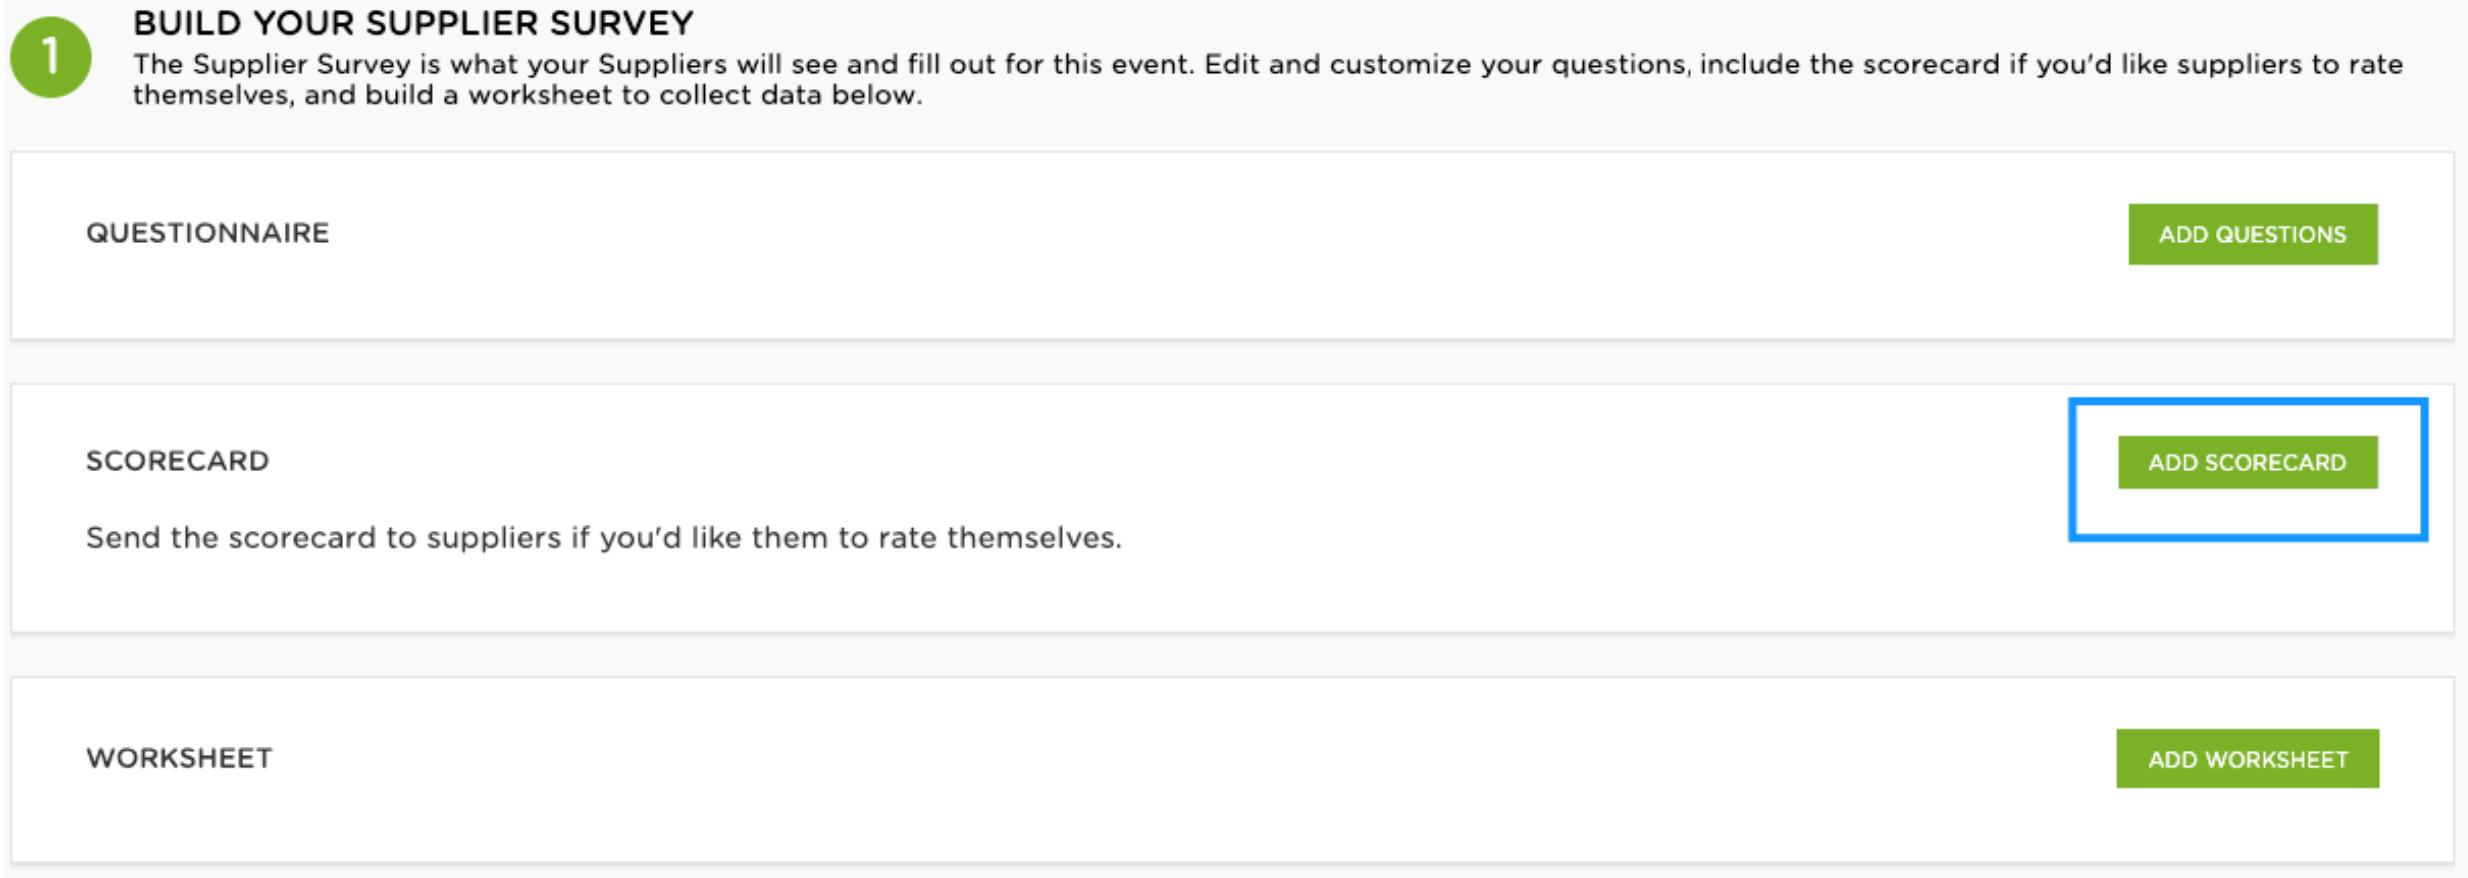 How To Build A Supplier Survey Scout Rfp